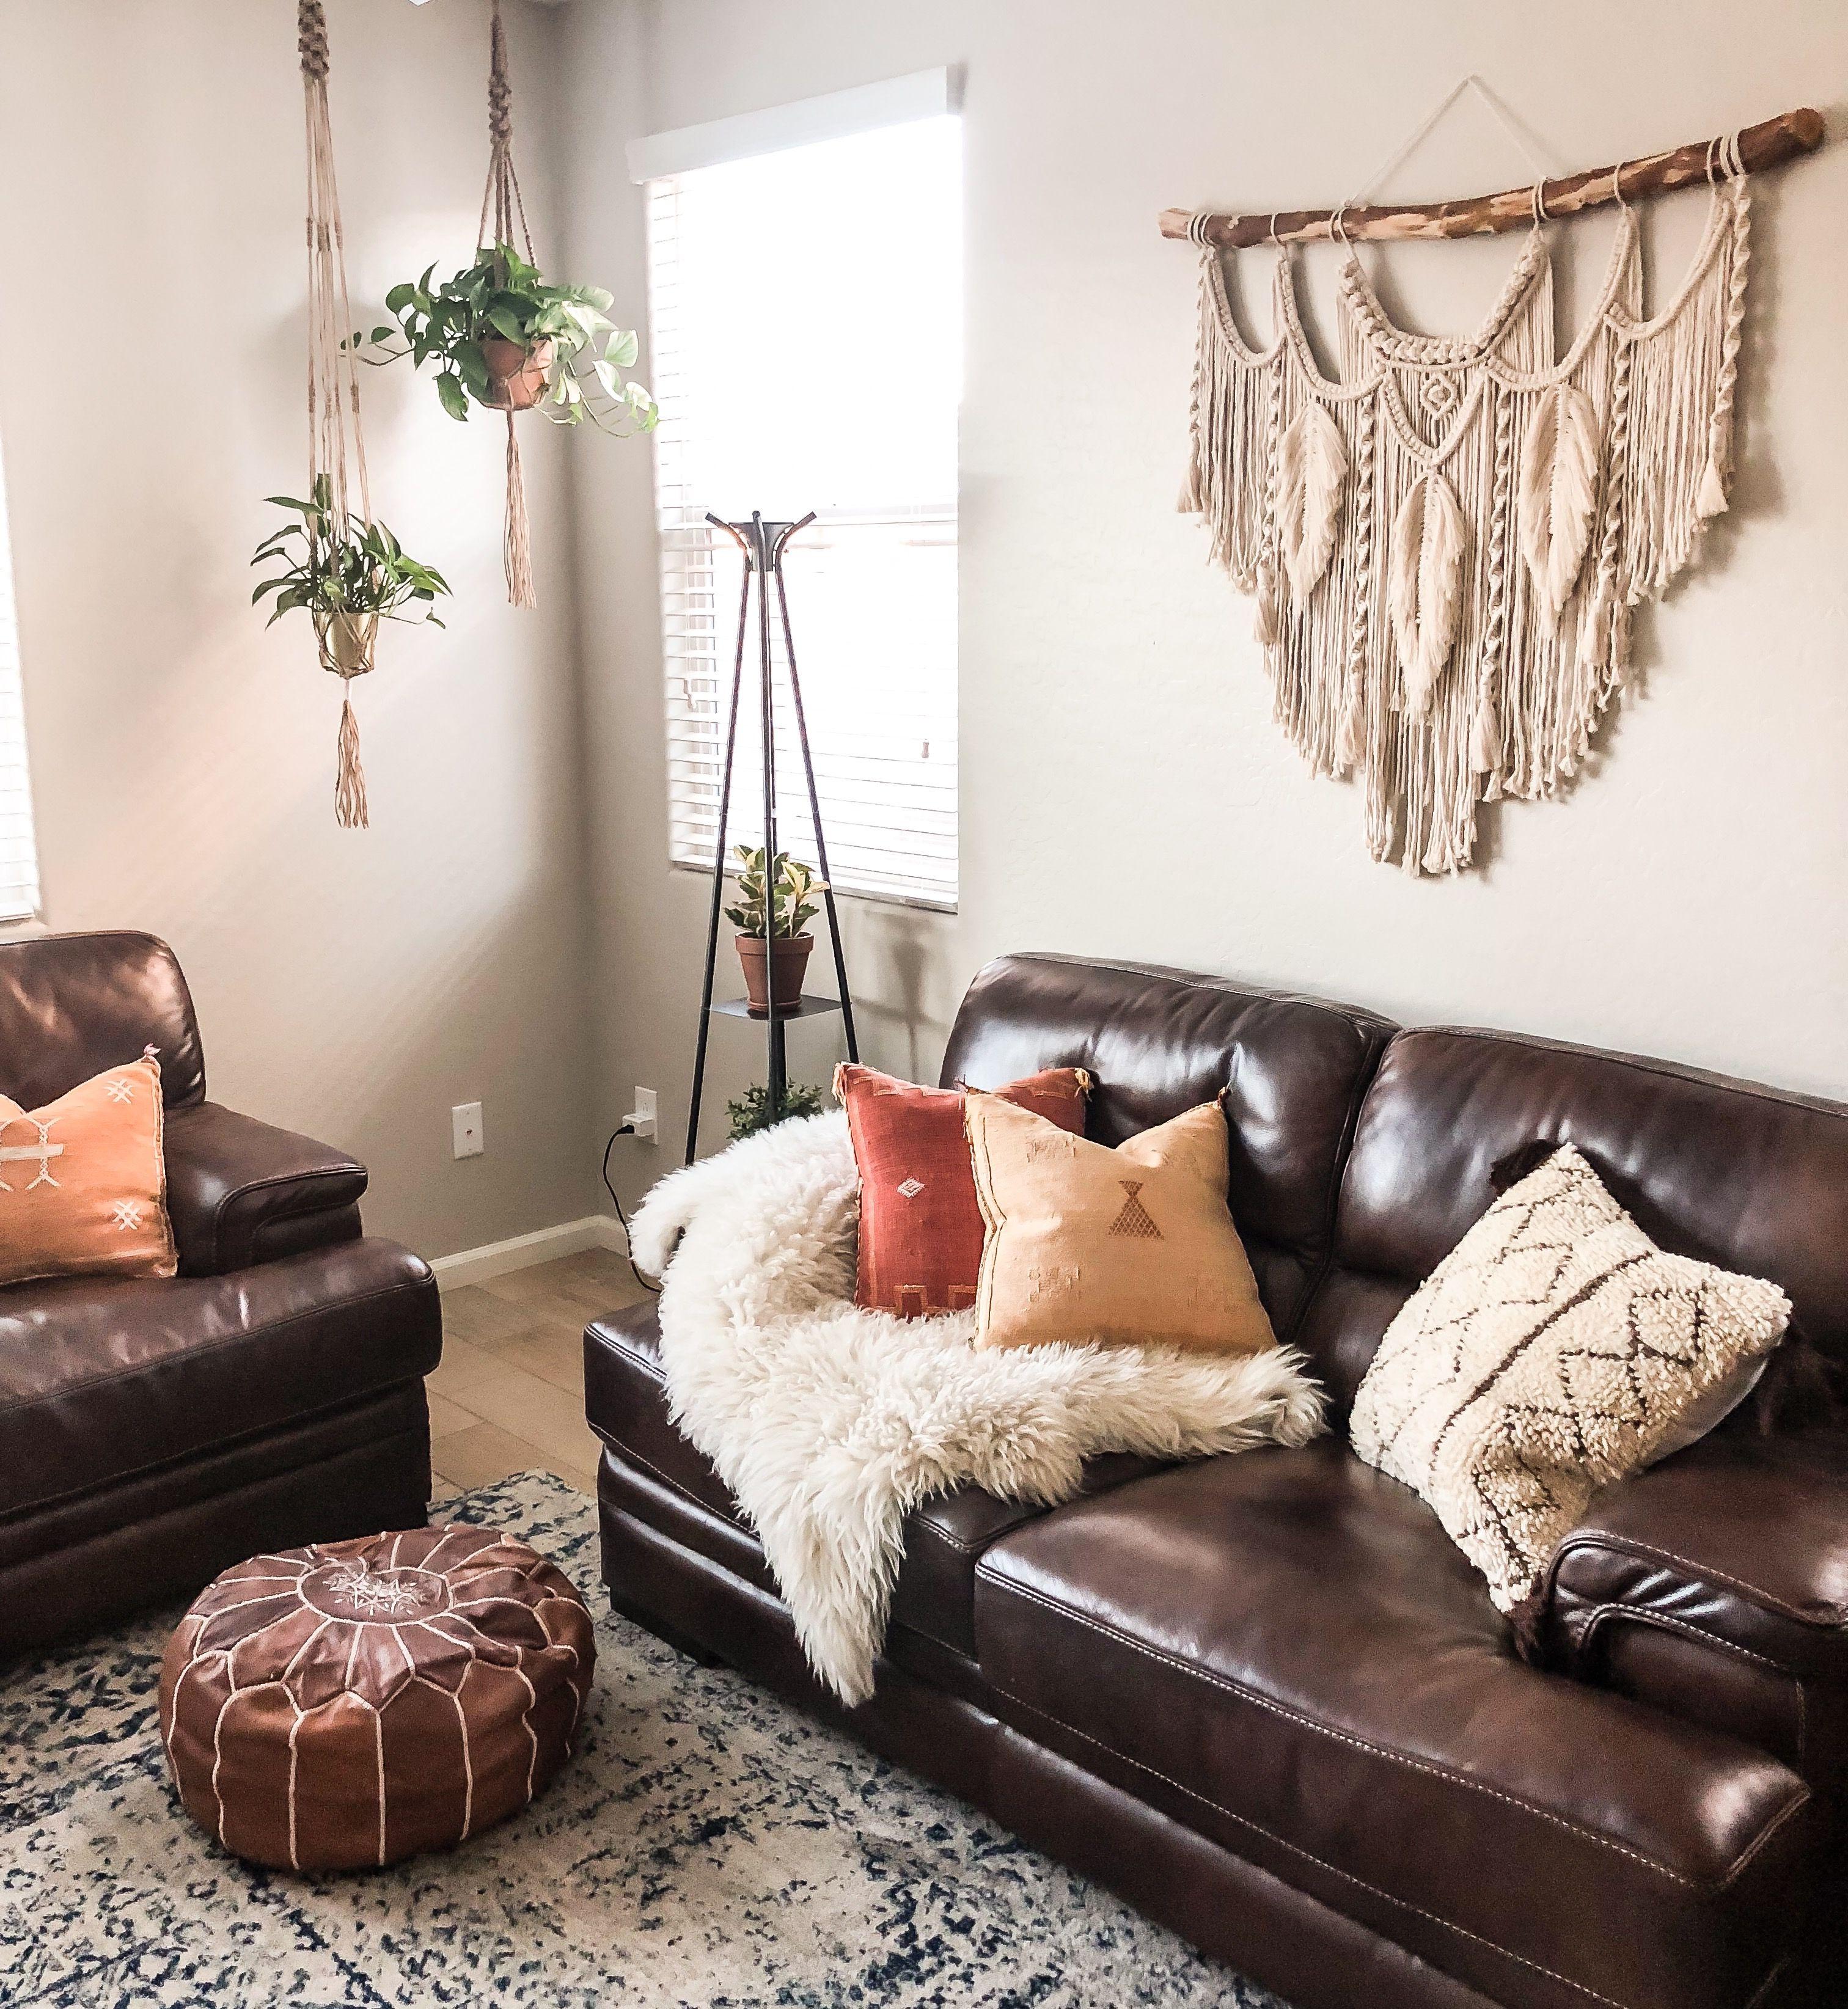 Macrame Wall Hanging Wall Hanging Living Room Bedroom Wall Hangings Boho Wall Decor